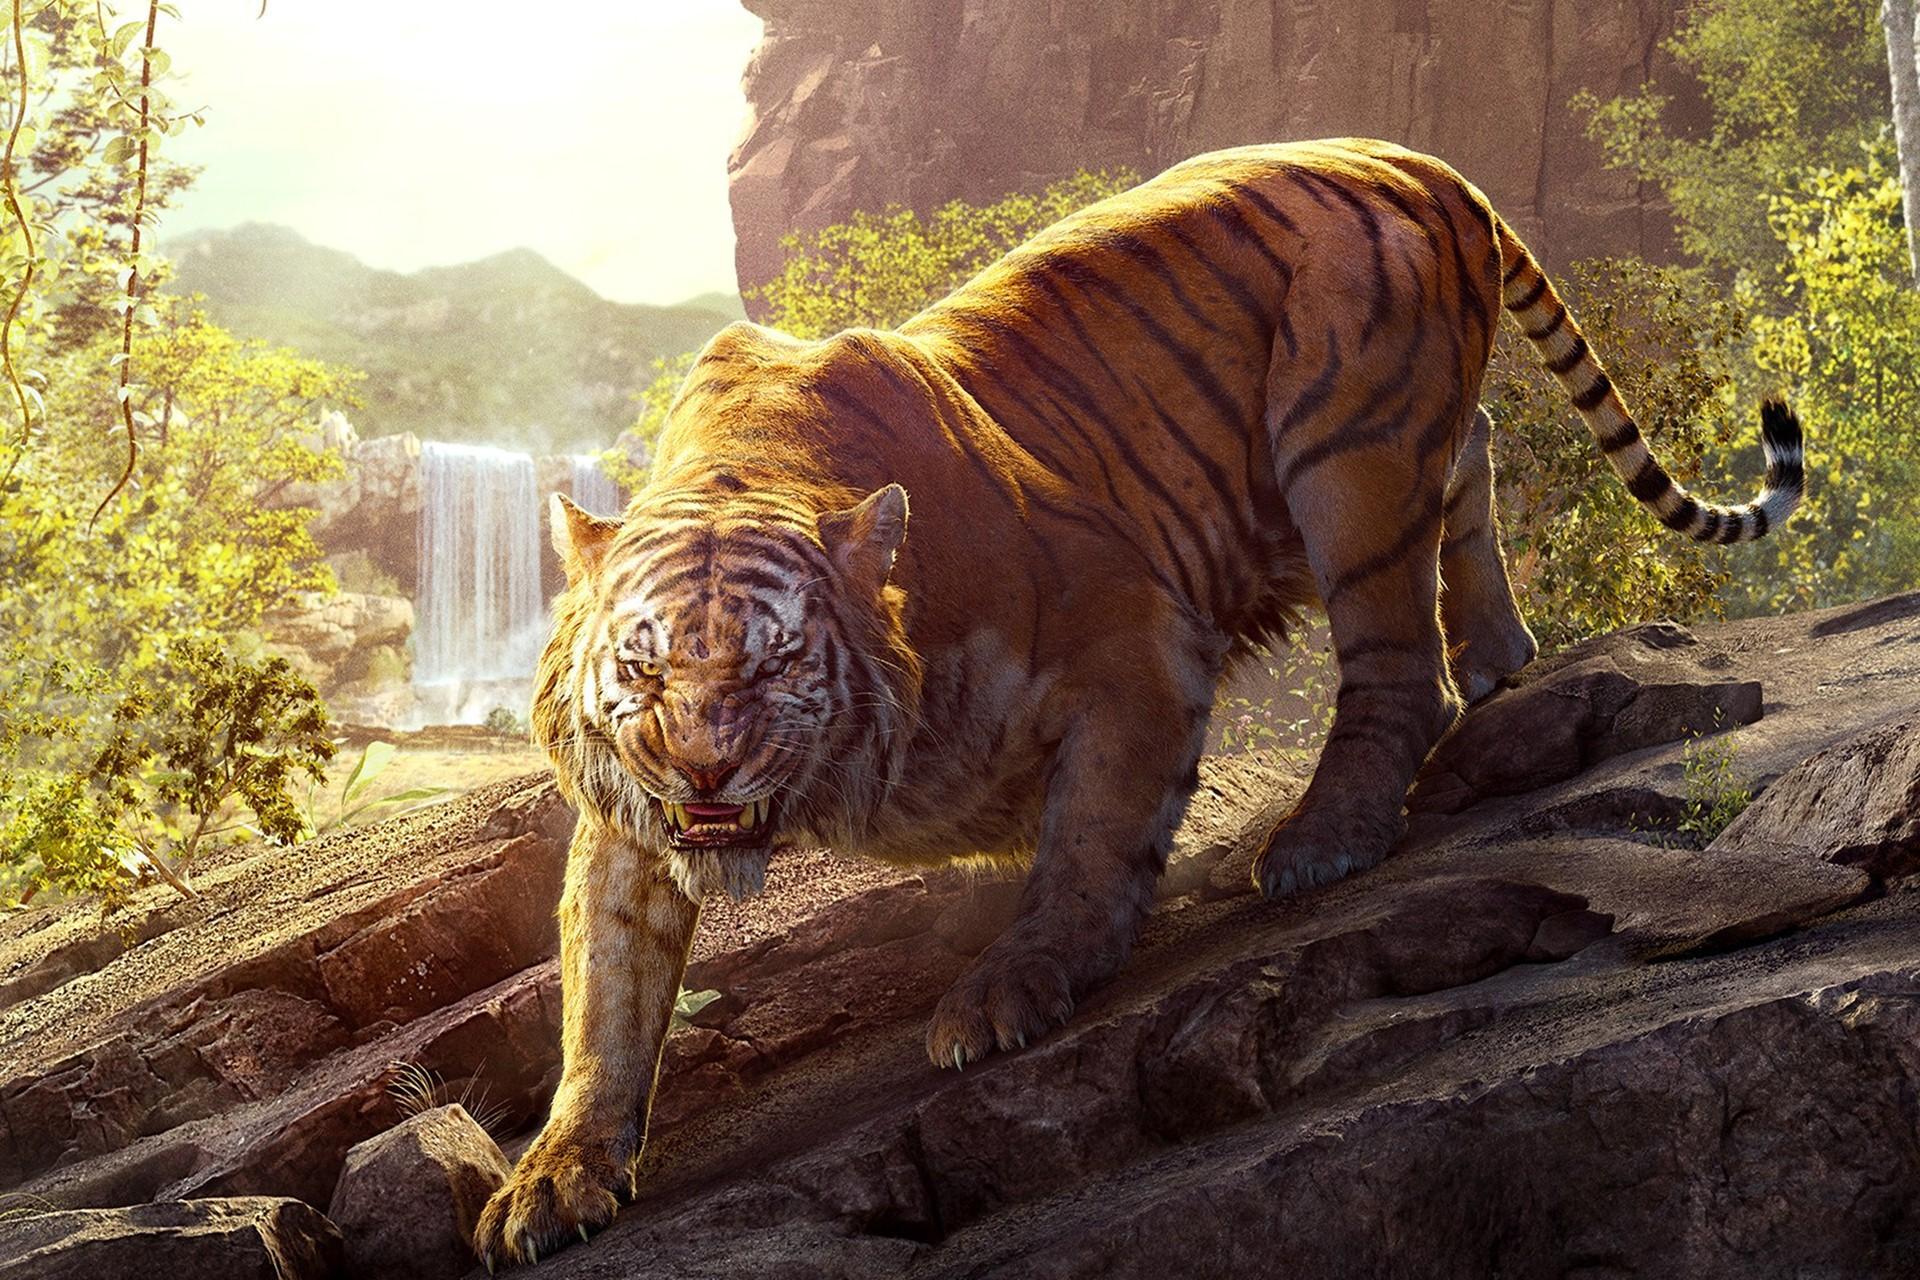 tiger images hd download